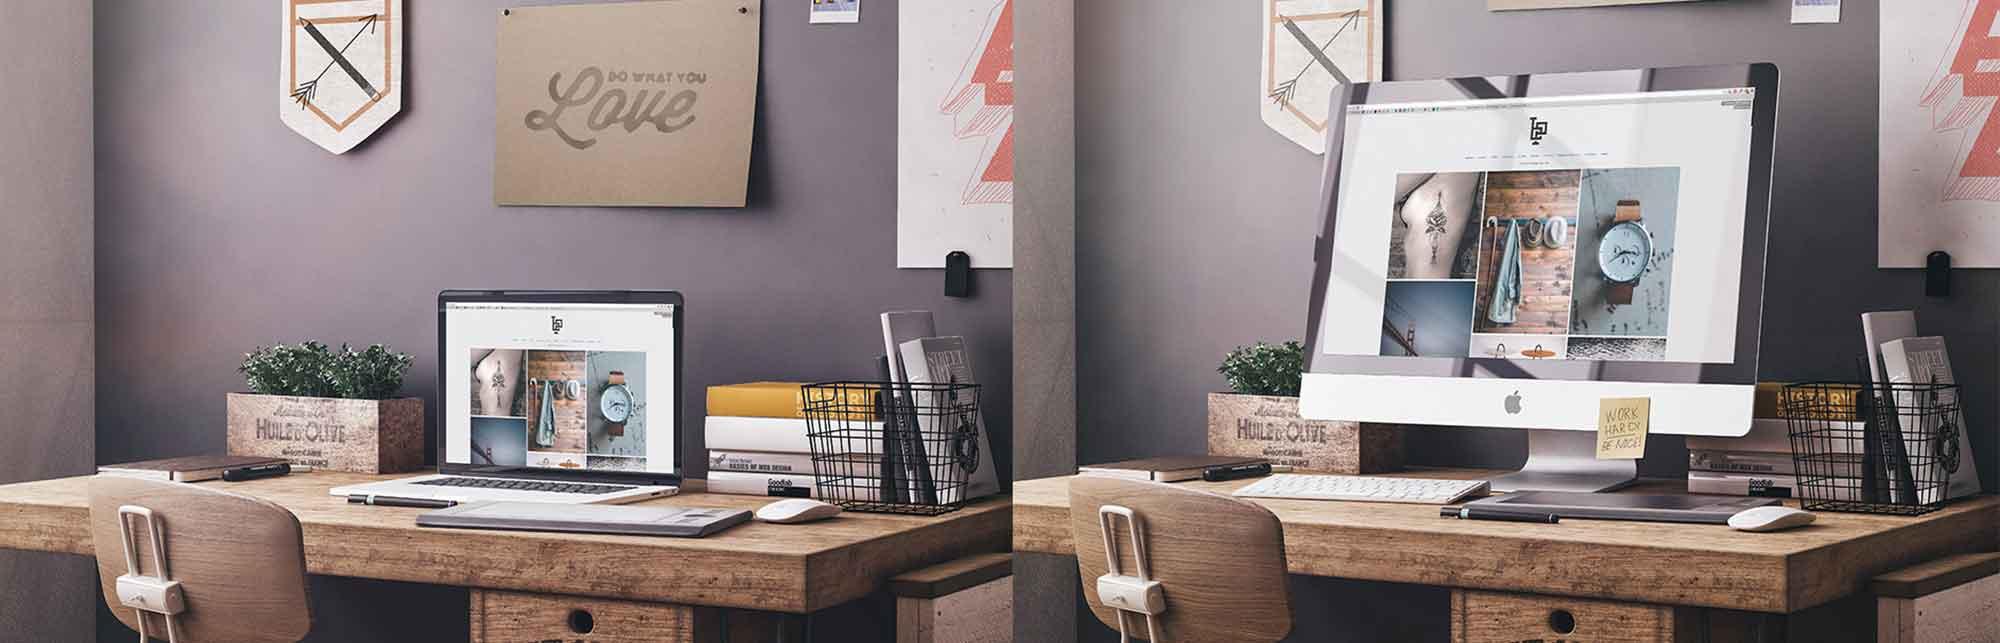 Workspace Mockup 2